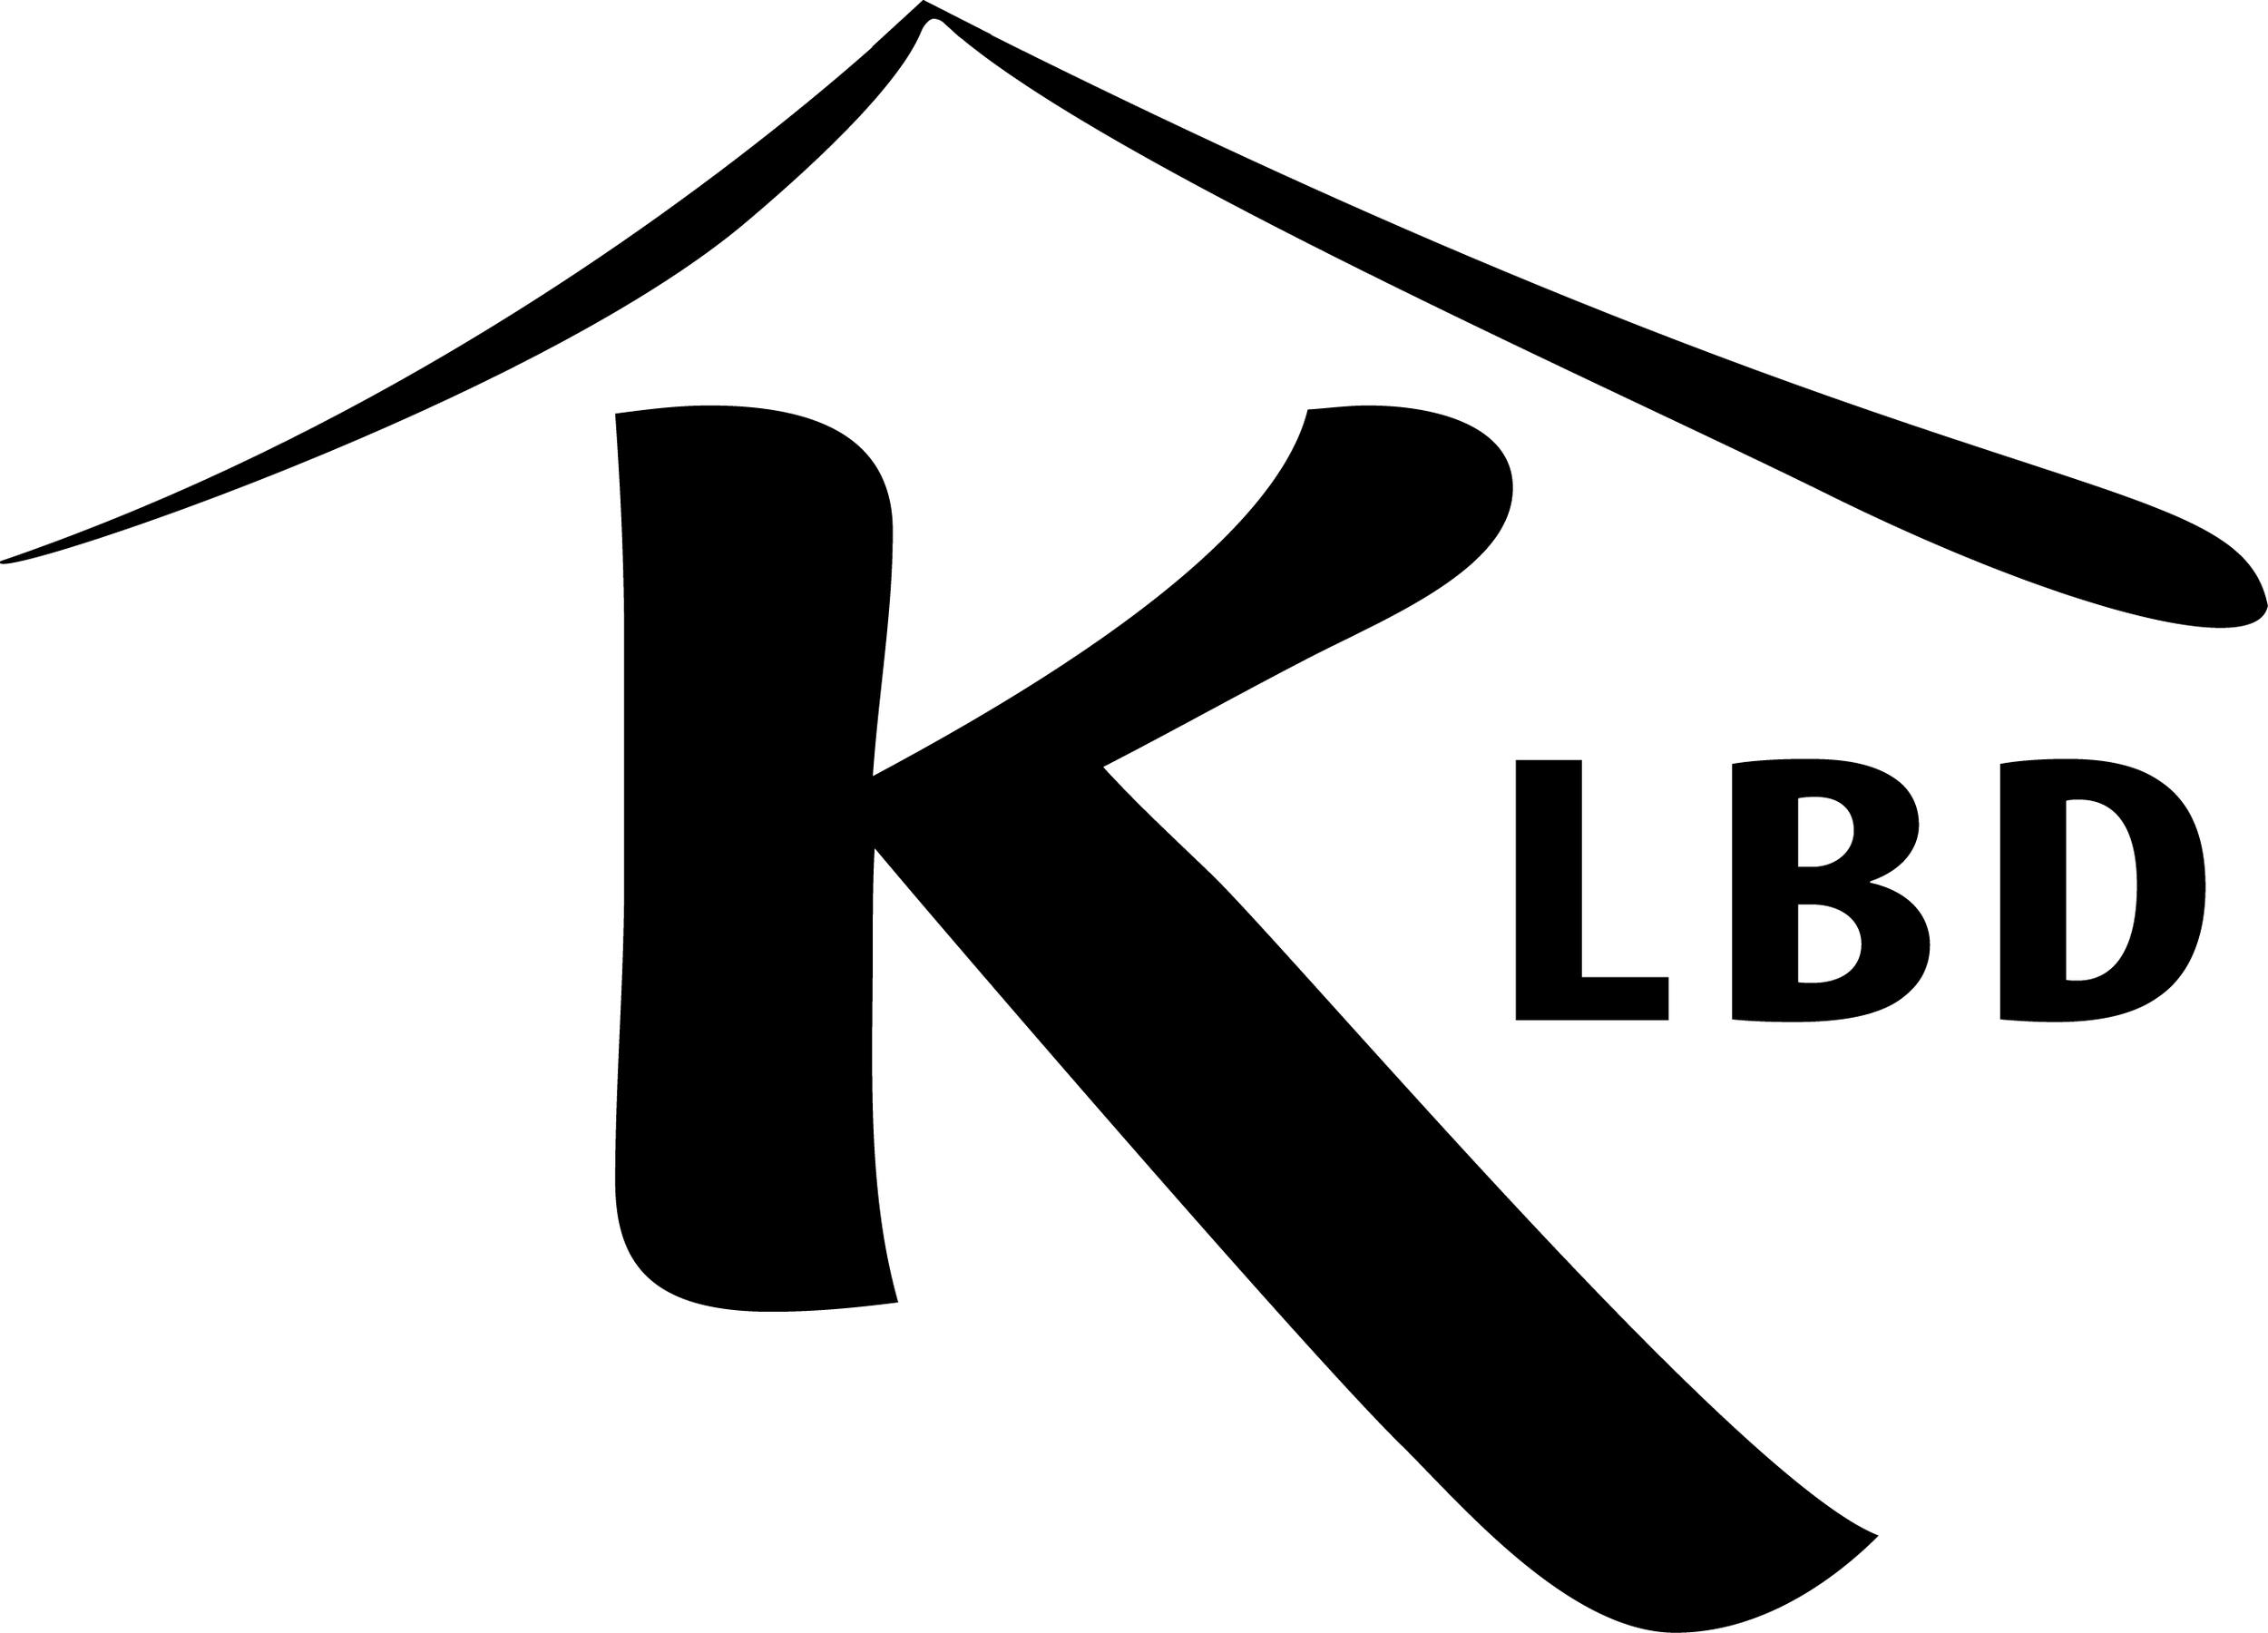 KLBD.jpg